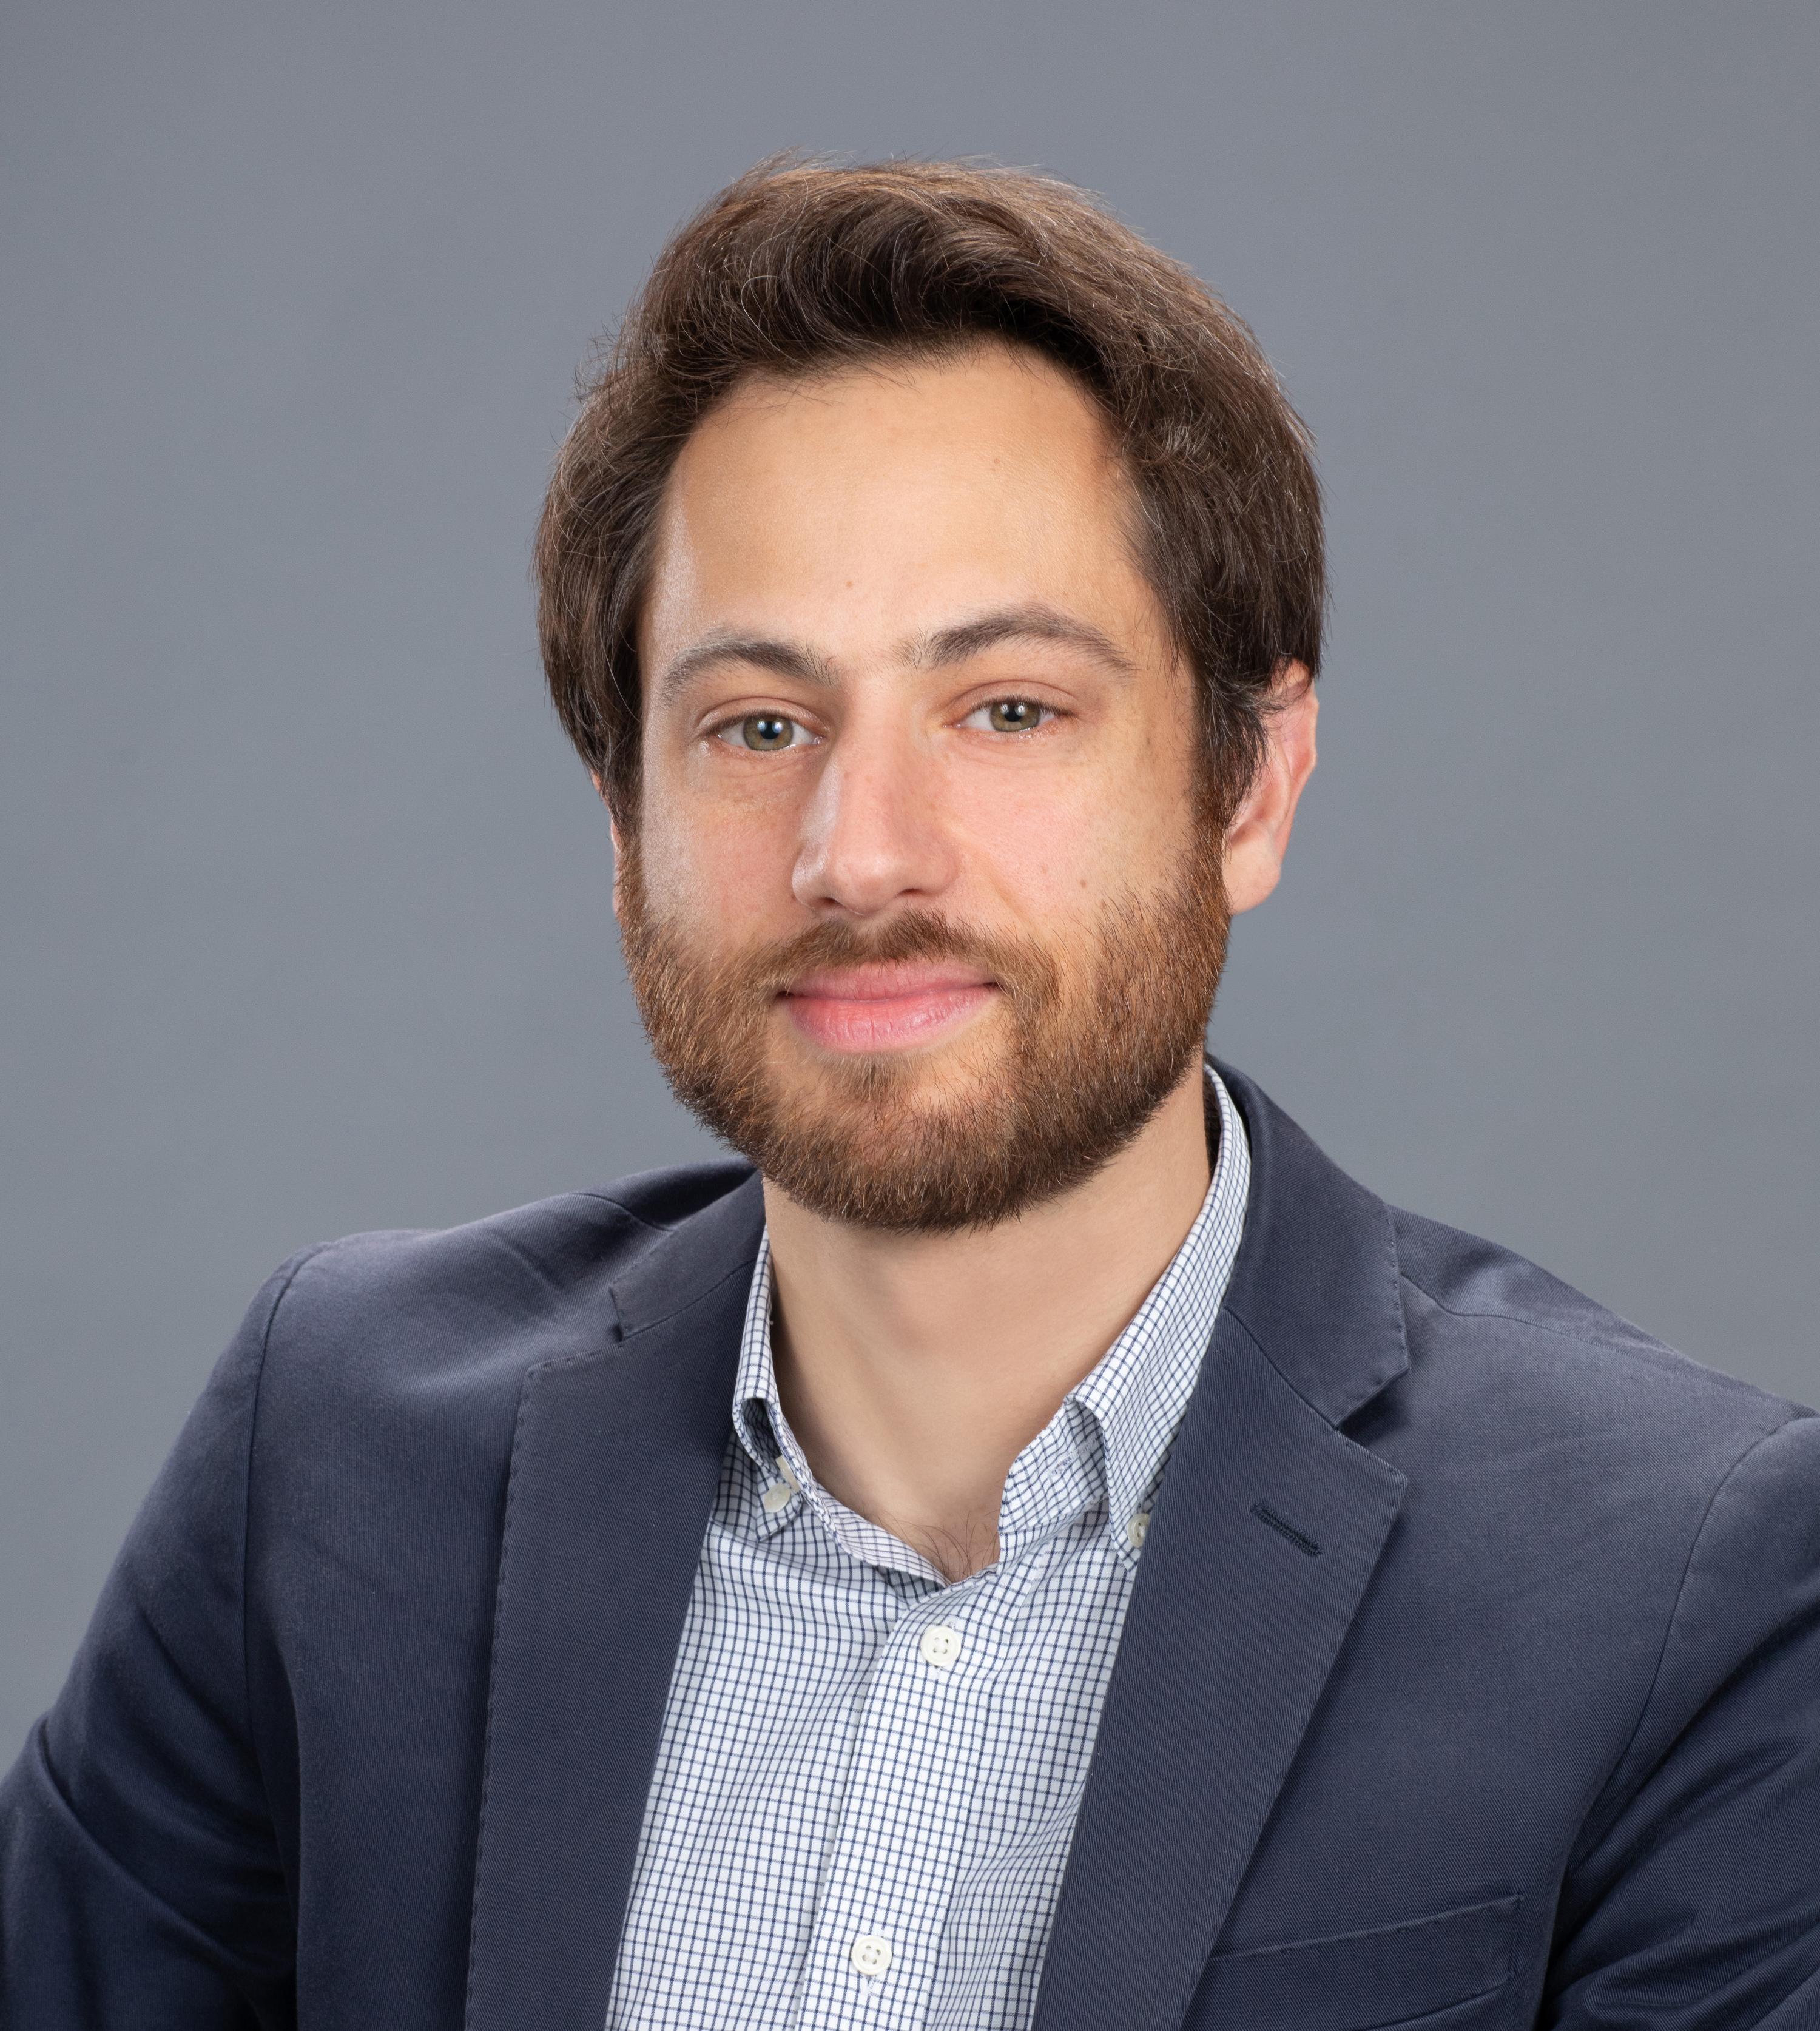 Shalev Roisman